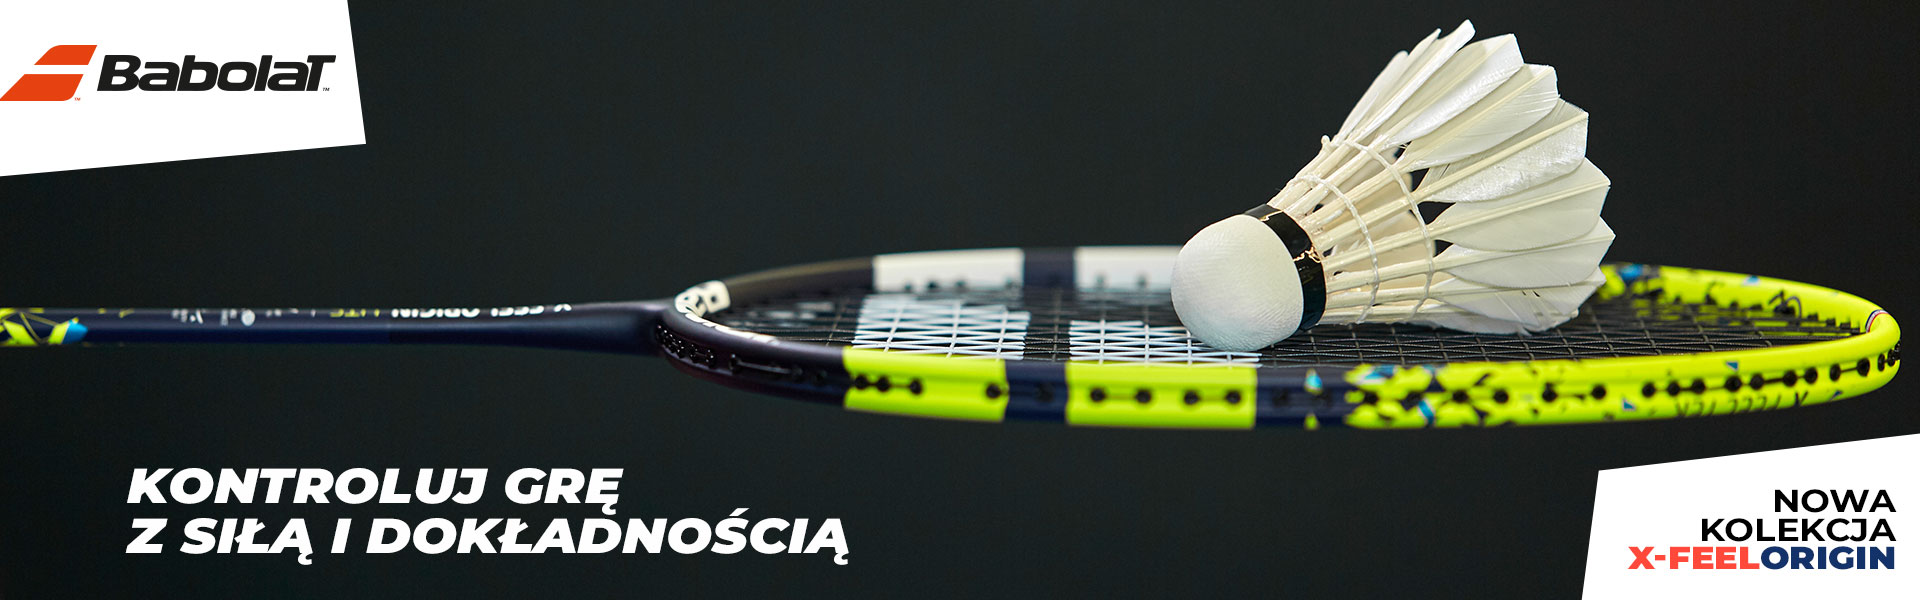 rakiety-badminton-origin.jpg